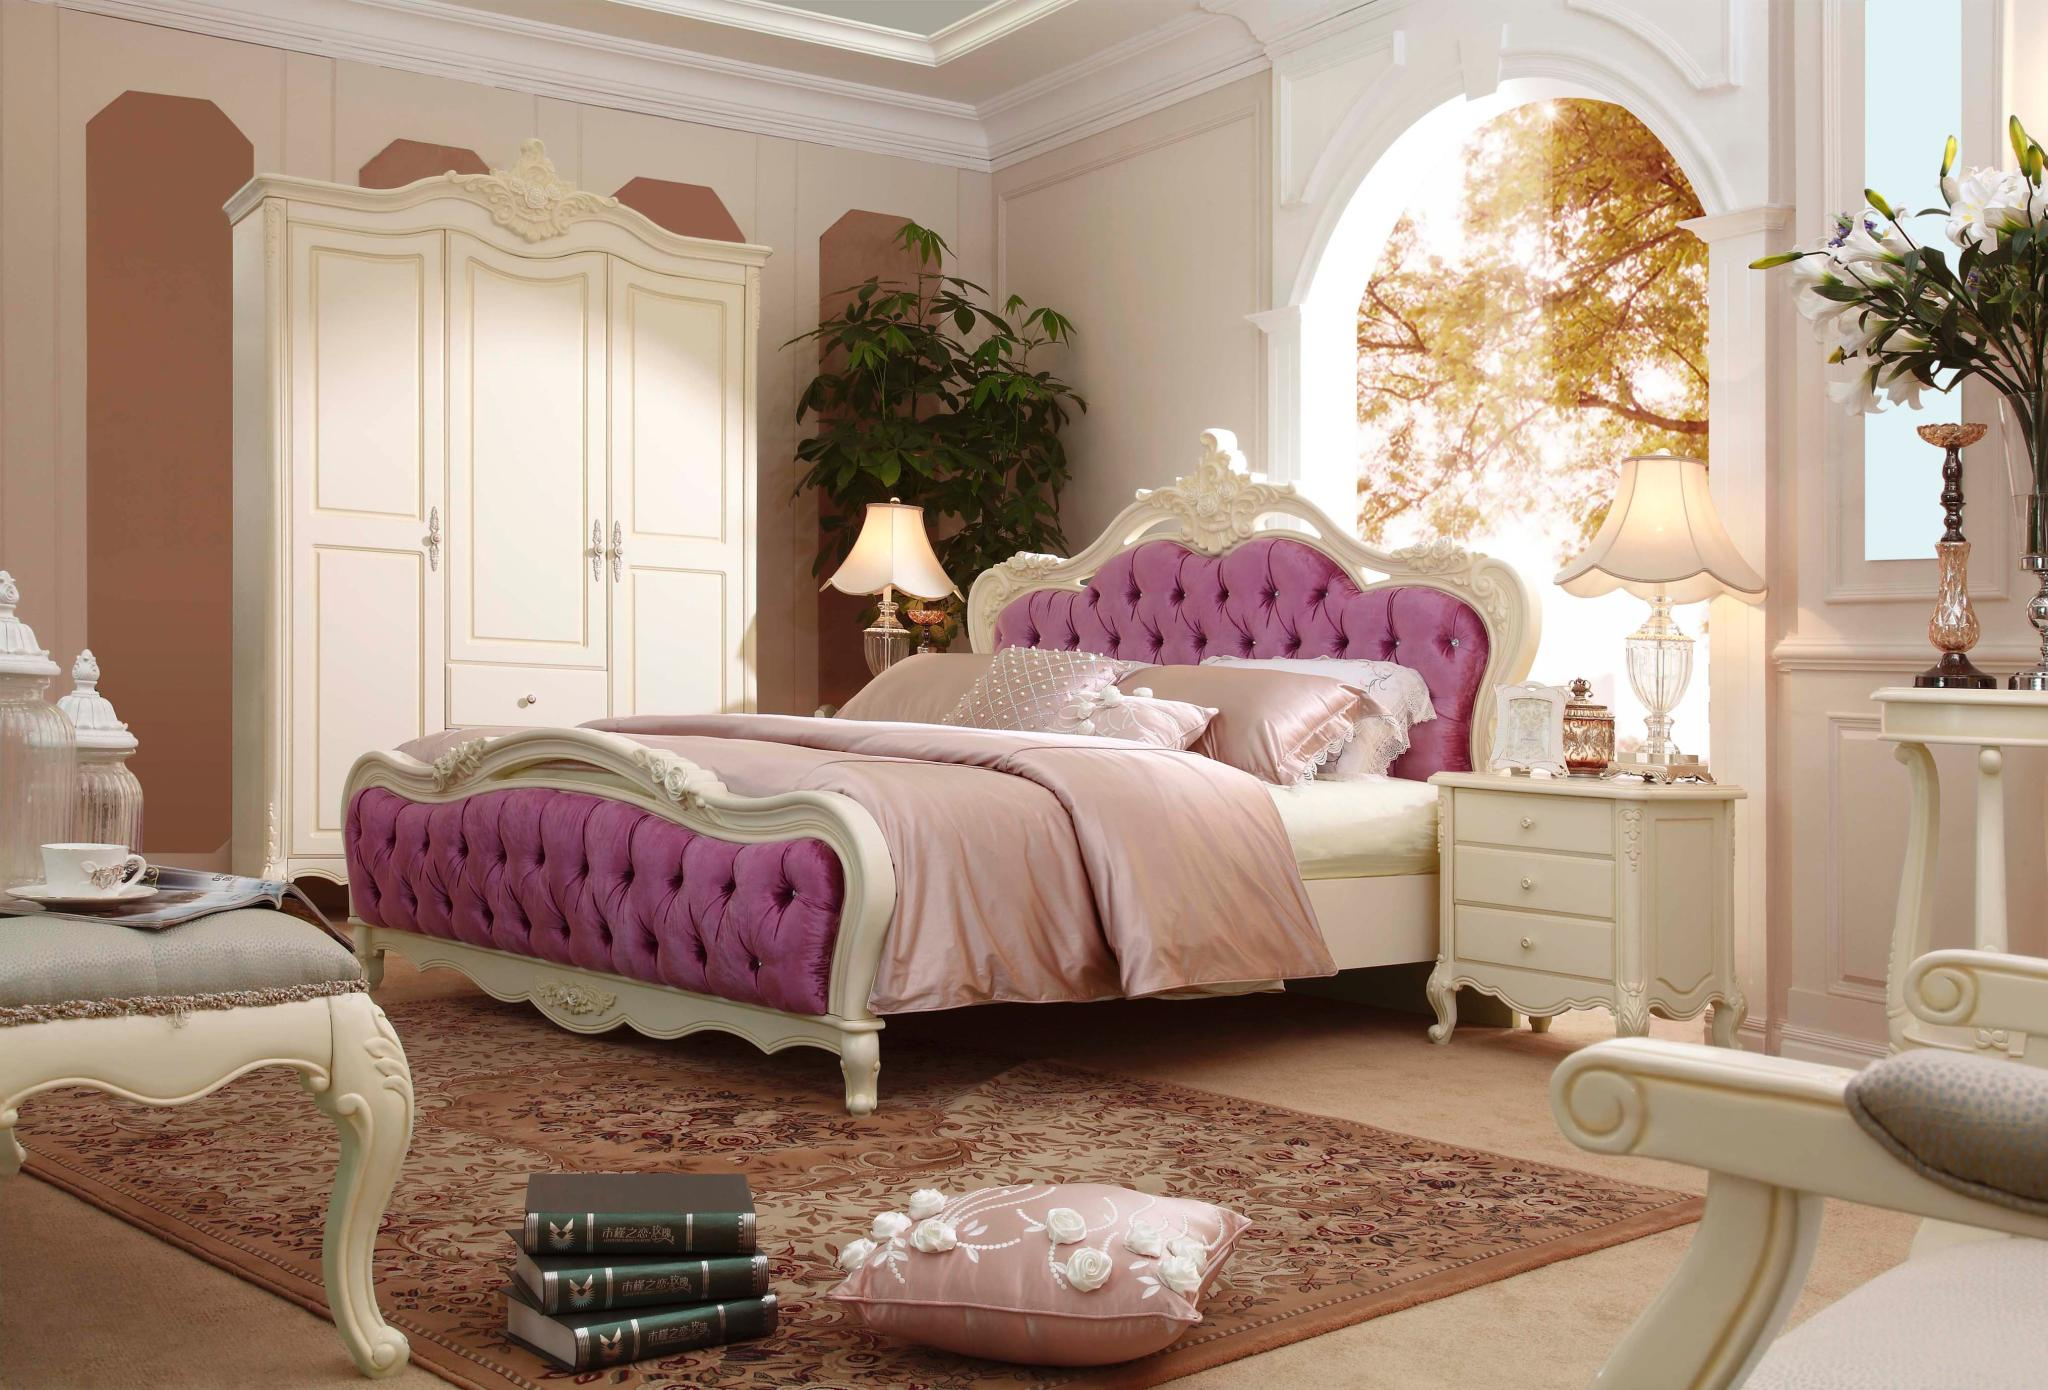 8m欧式床 材质 美国橡森图片